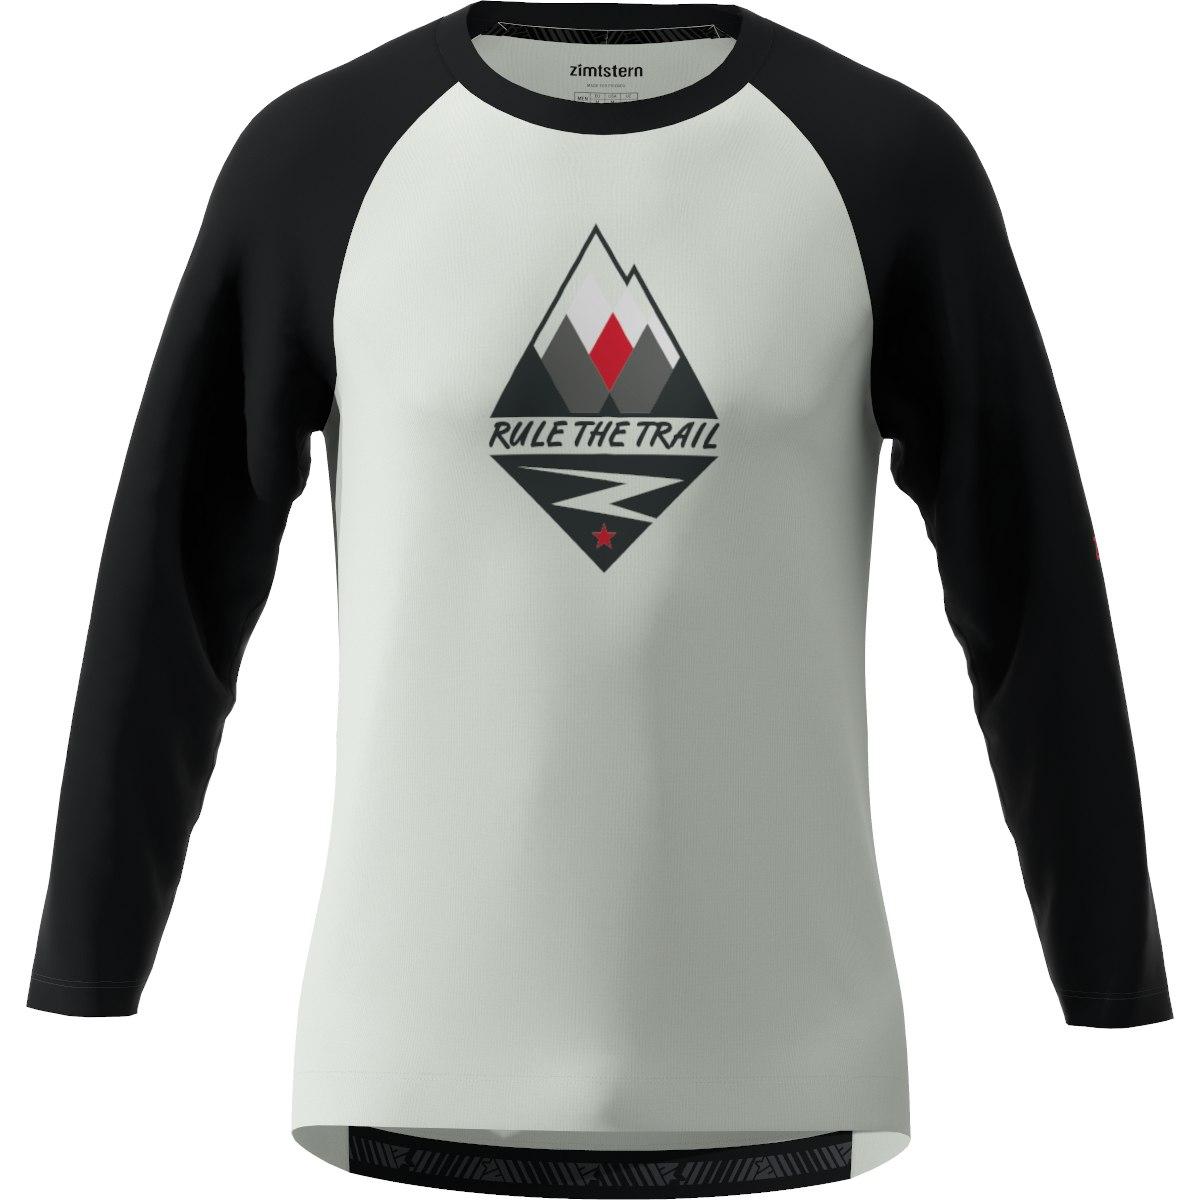 Zimtstern PureFlowz 3/4 Sleeve MTB-Shirt - glacier grey/pirate black/cyber red